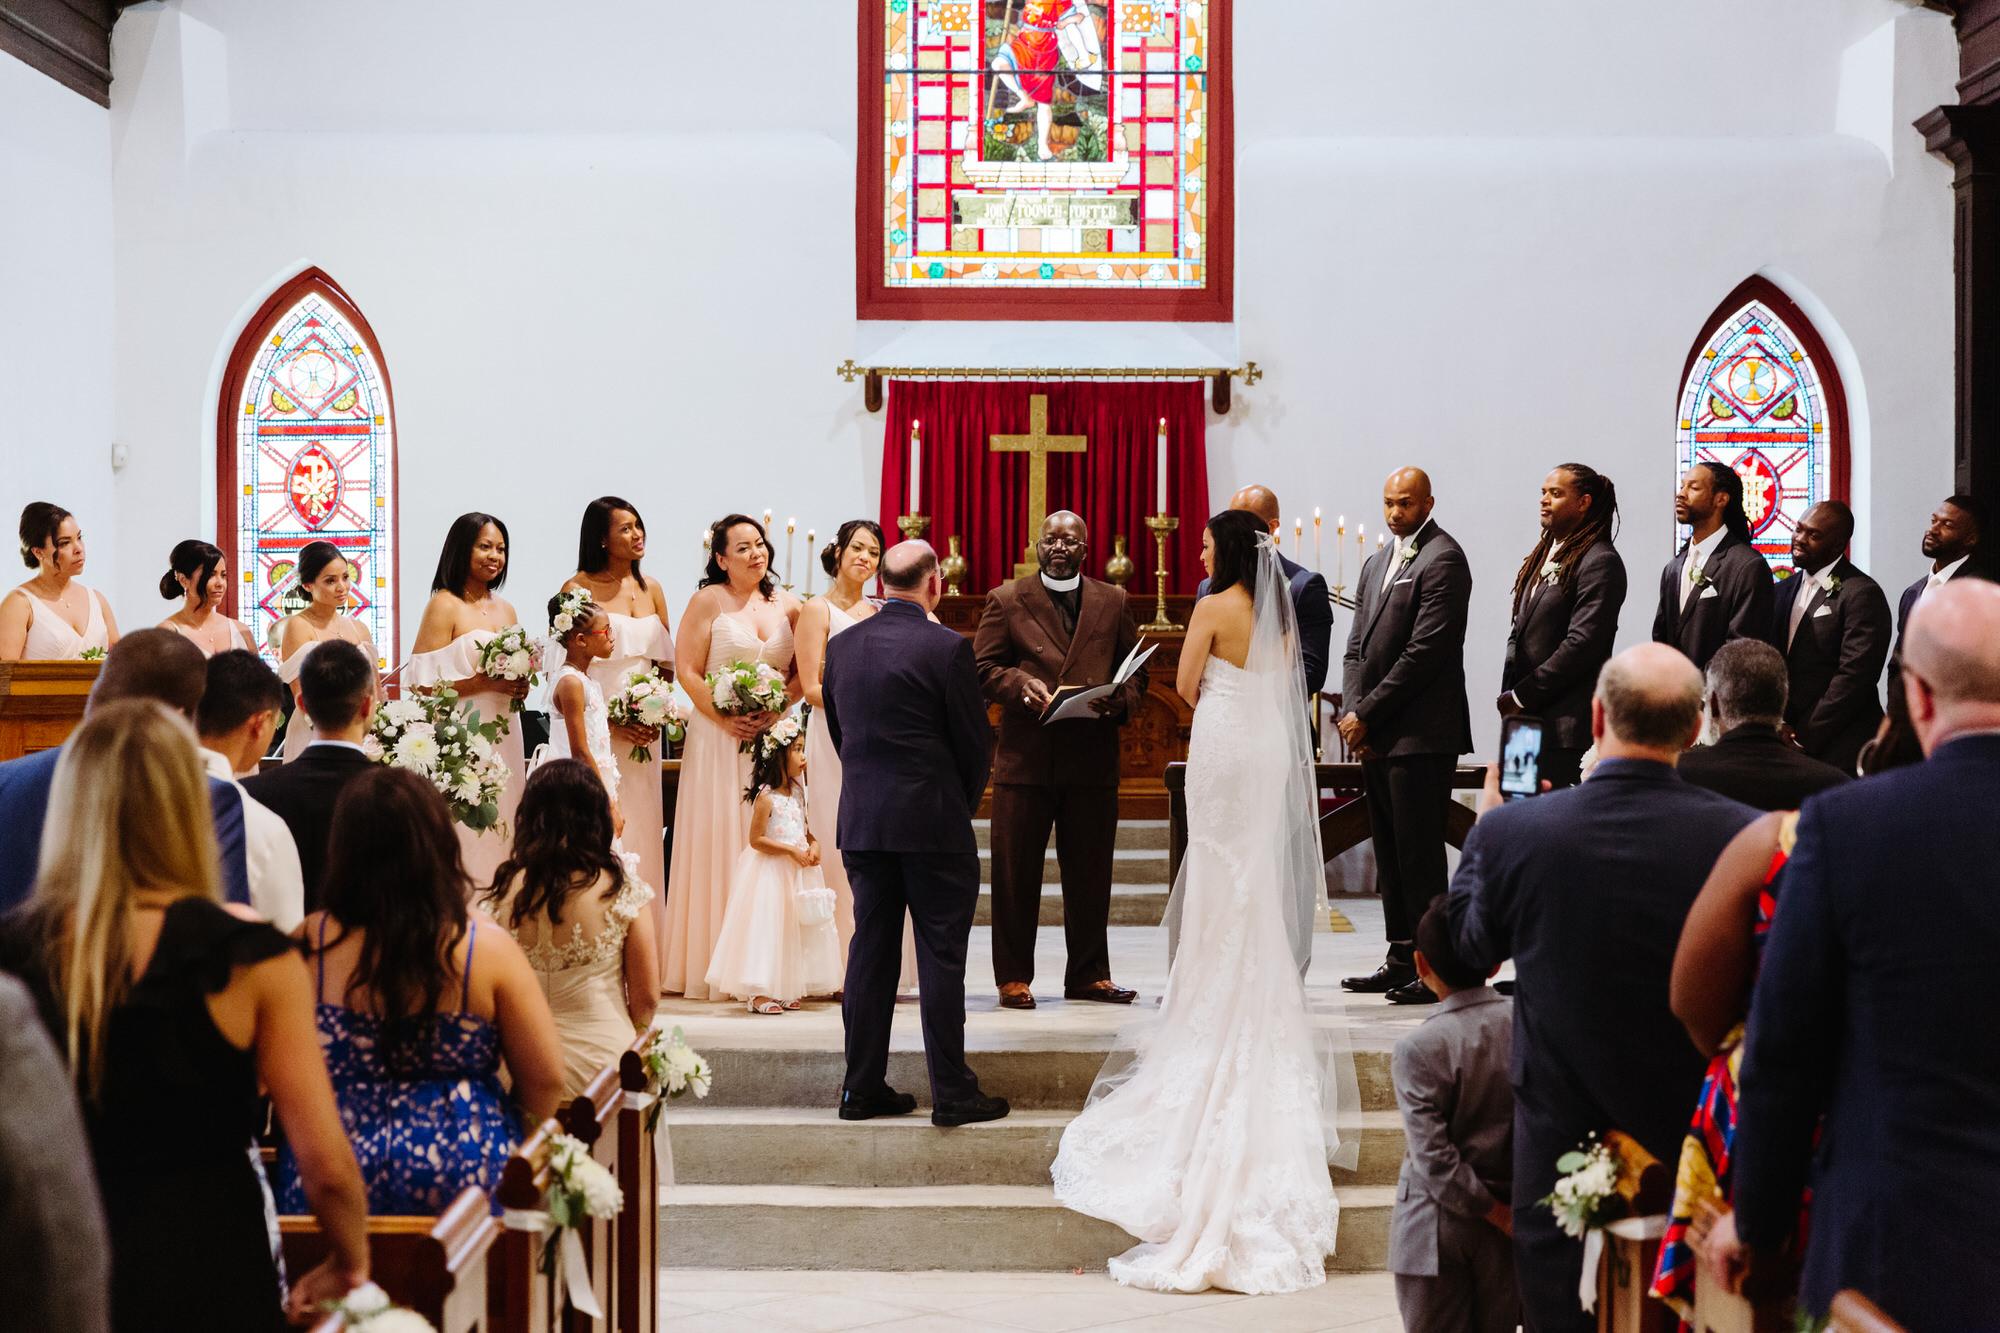 st-lukes-chapel-cannon-green-charleston-wedding-919.JPG